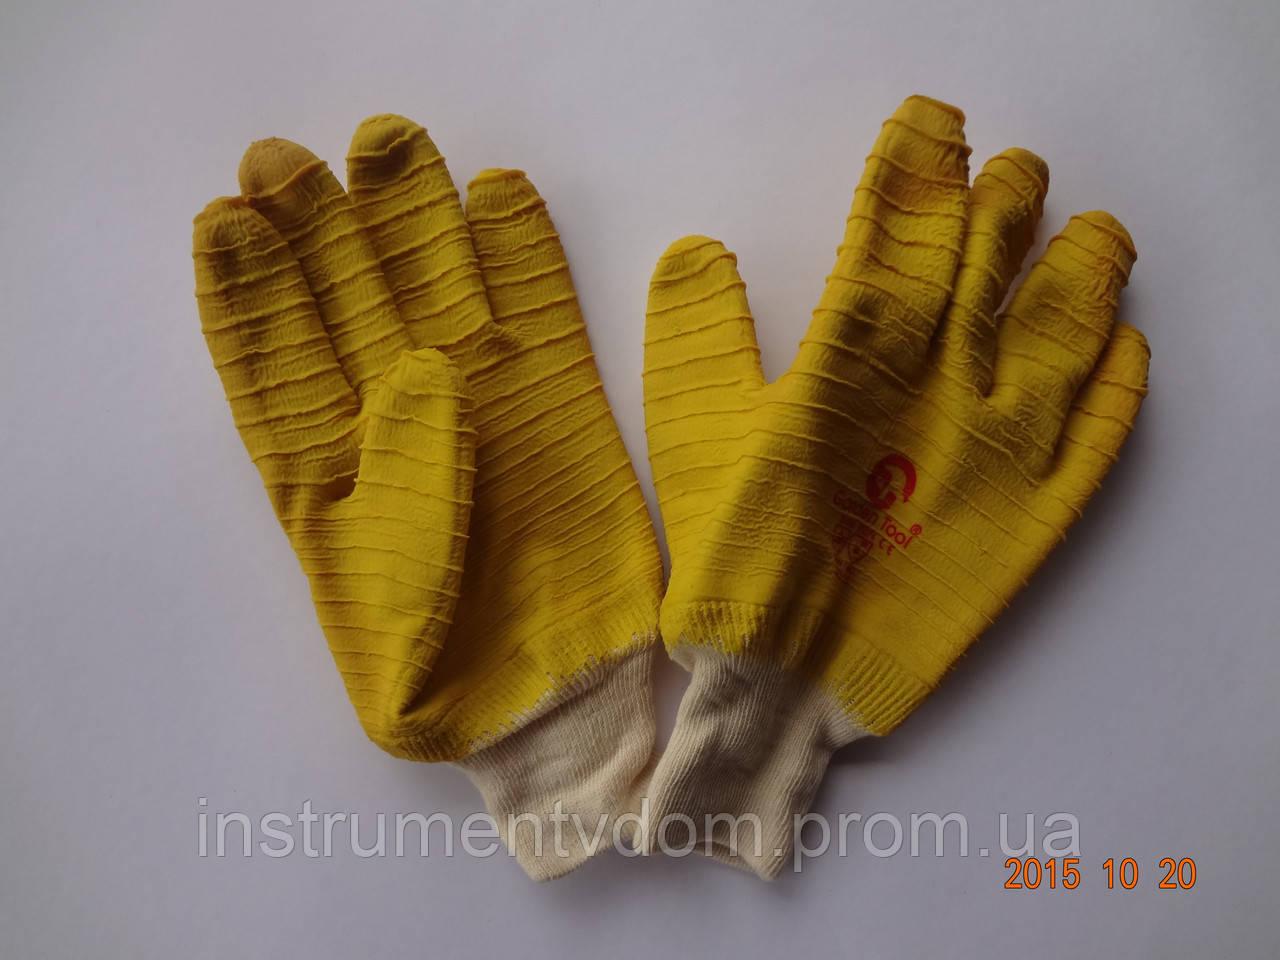 Перчатки х/б с желтым латексным покрытием (упаковка 12 пар)